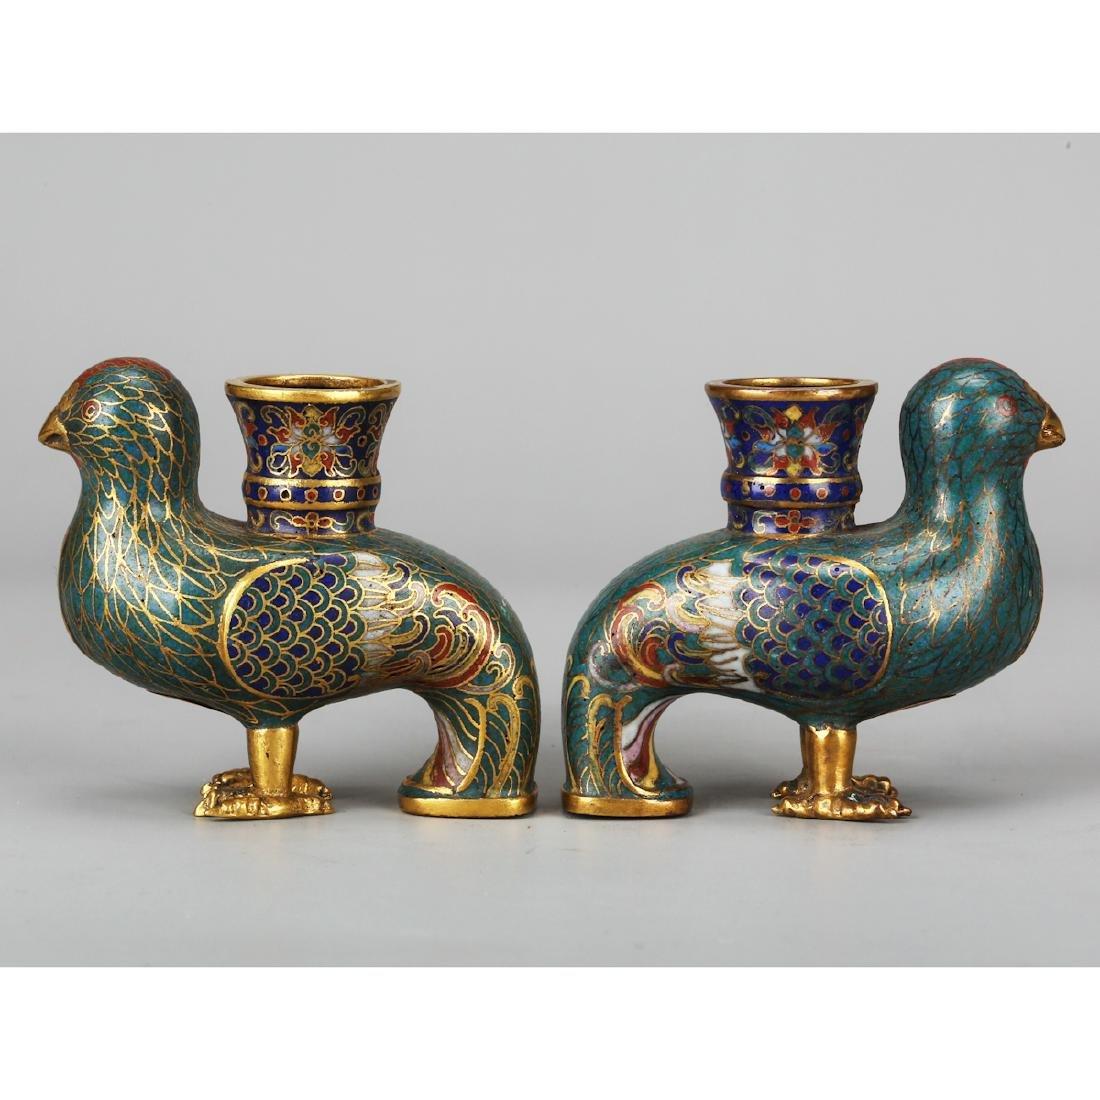 CHINESE CLOISONNE BIRD VASES, PAIR - 5